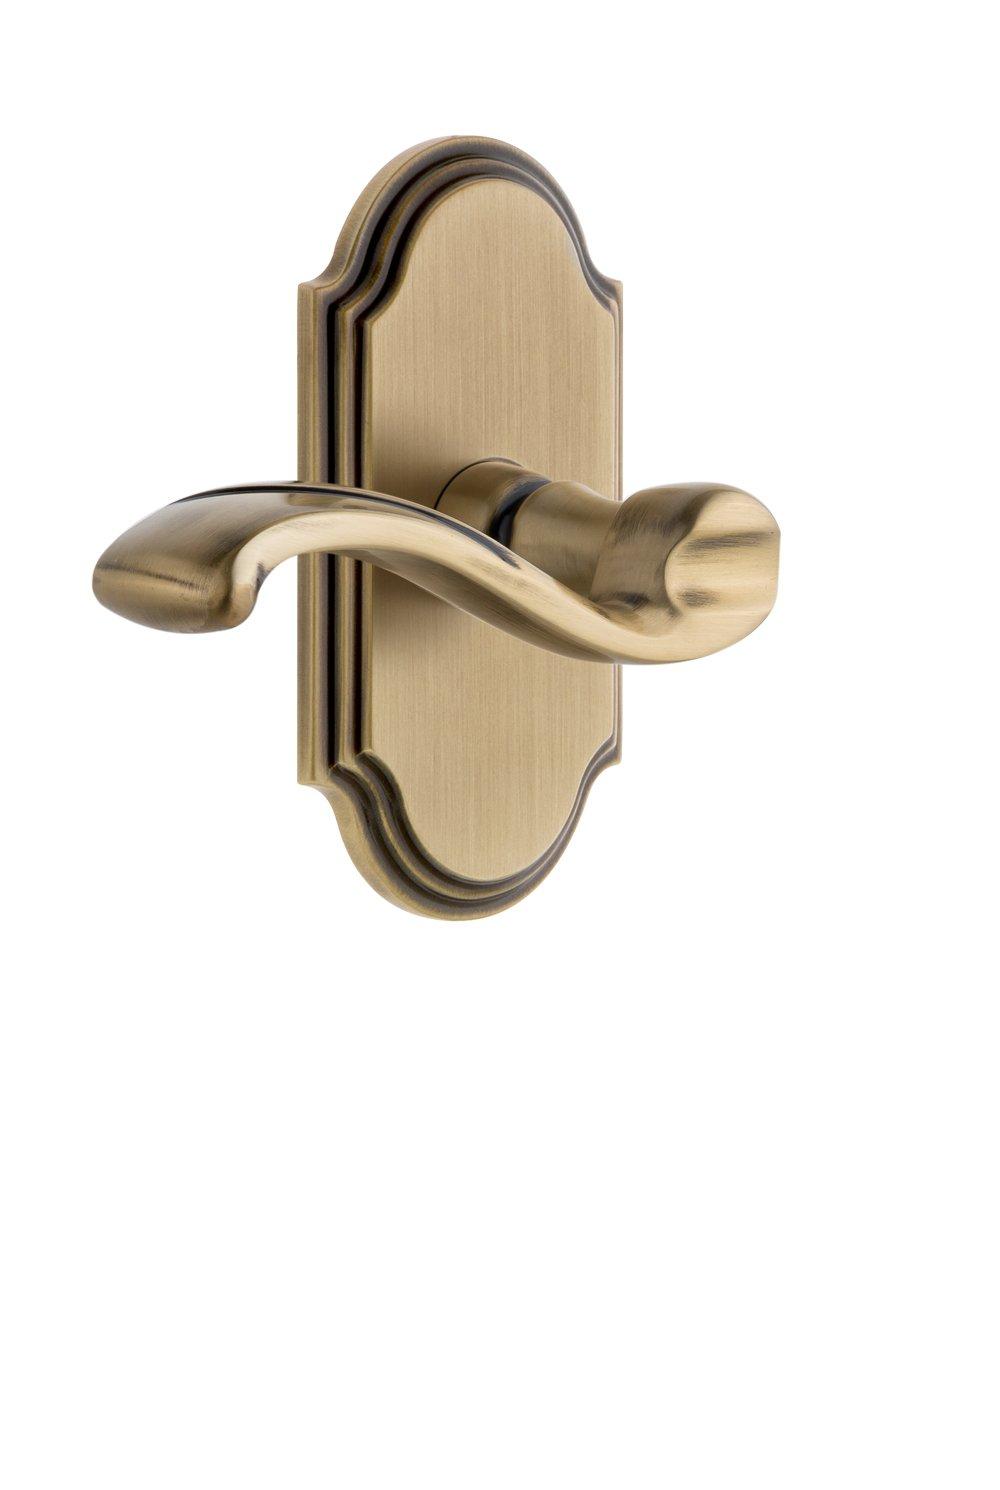 Grandeur 810698 Carre Plate Passage with Bellagio Lever in Lifetime Brass, Passage - 2.375 Grandeur Hardware